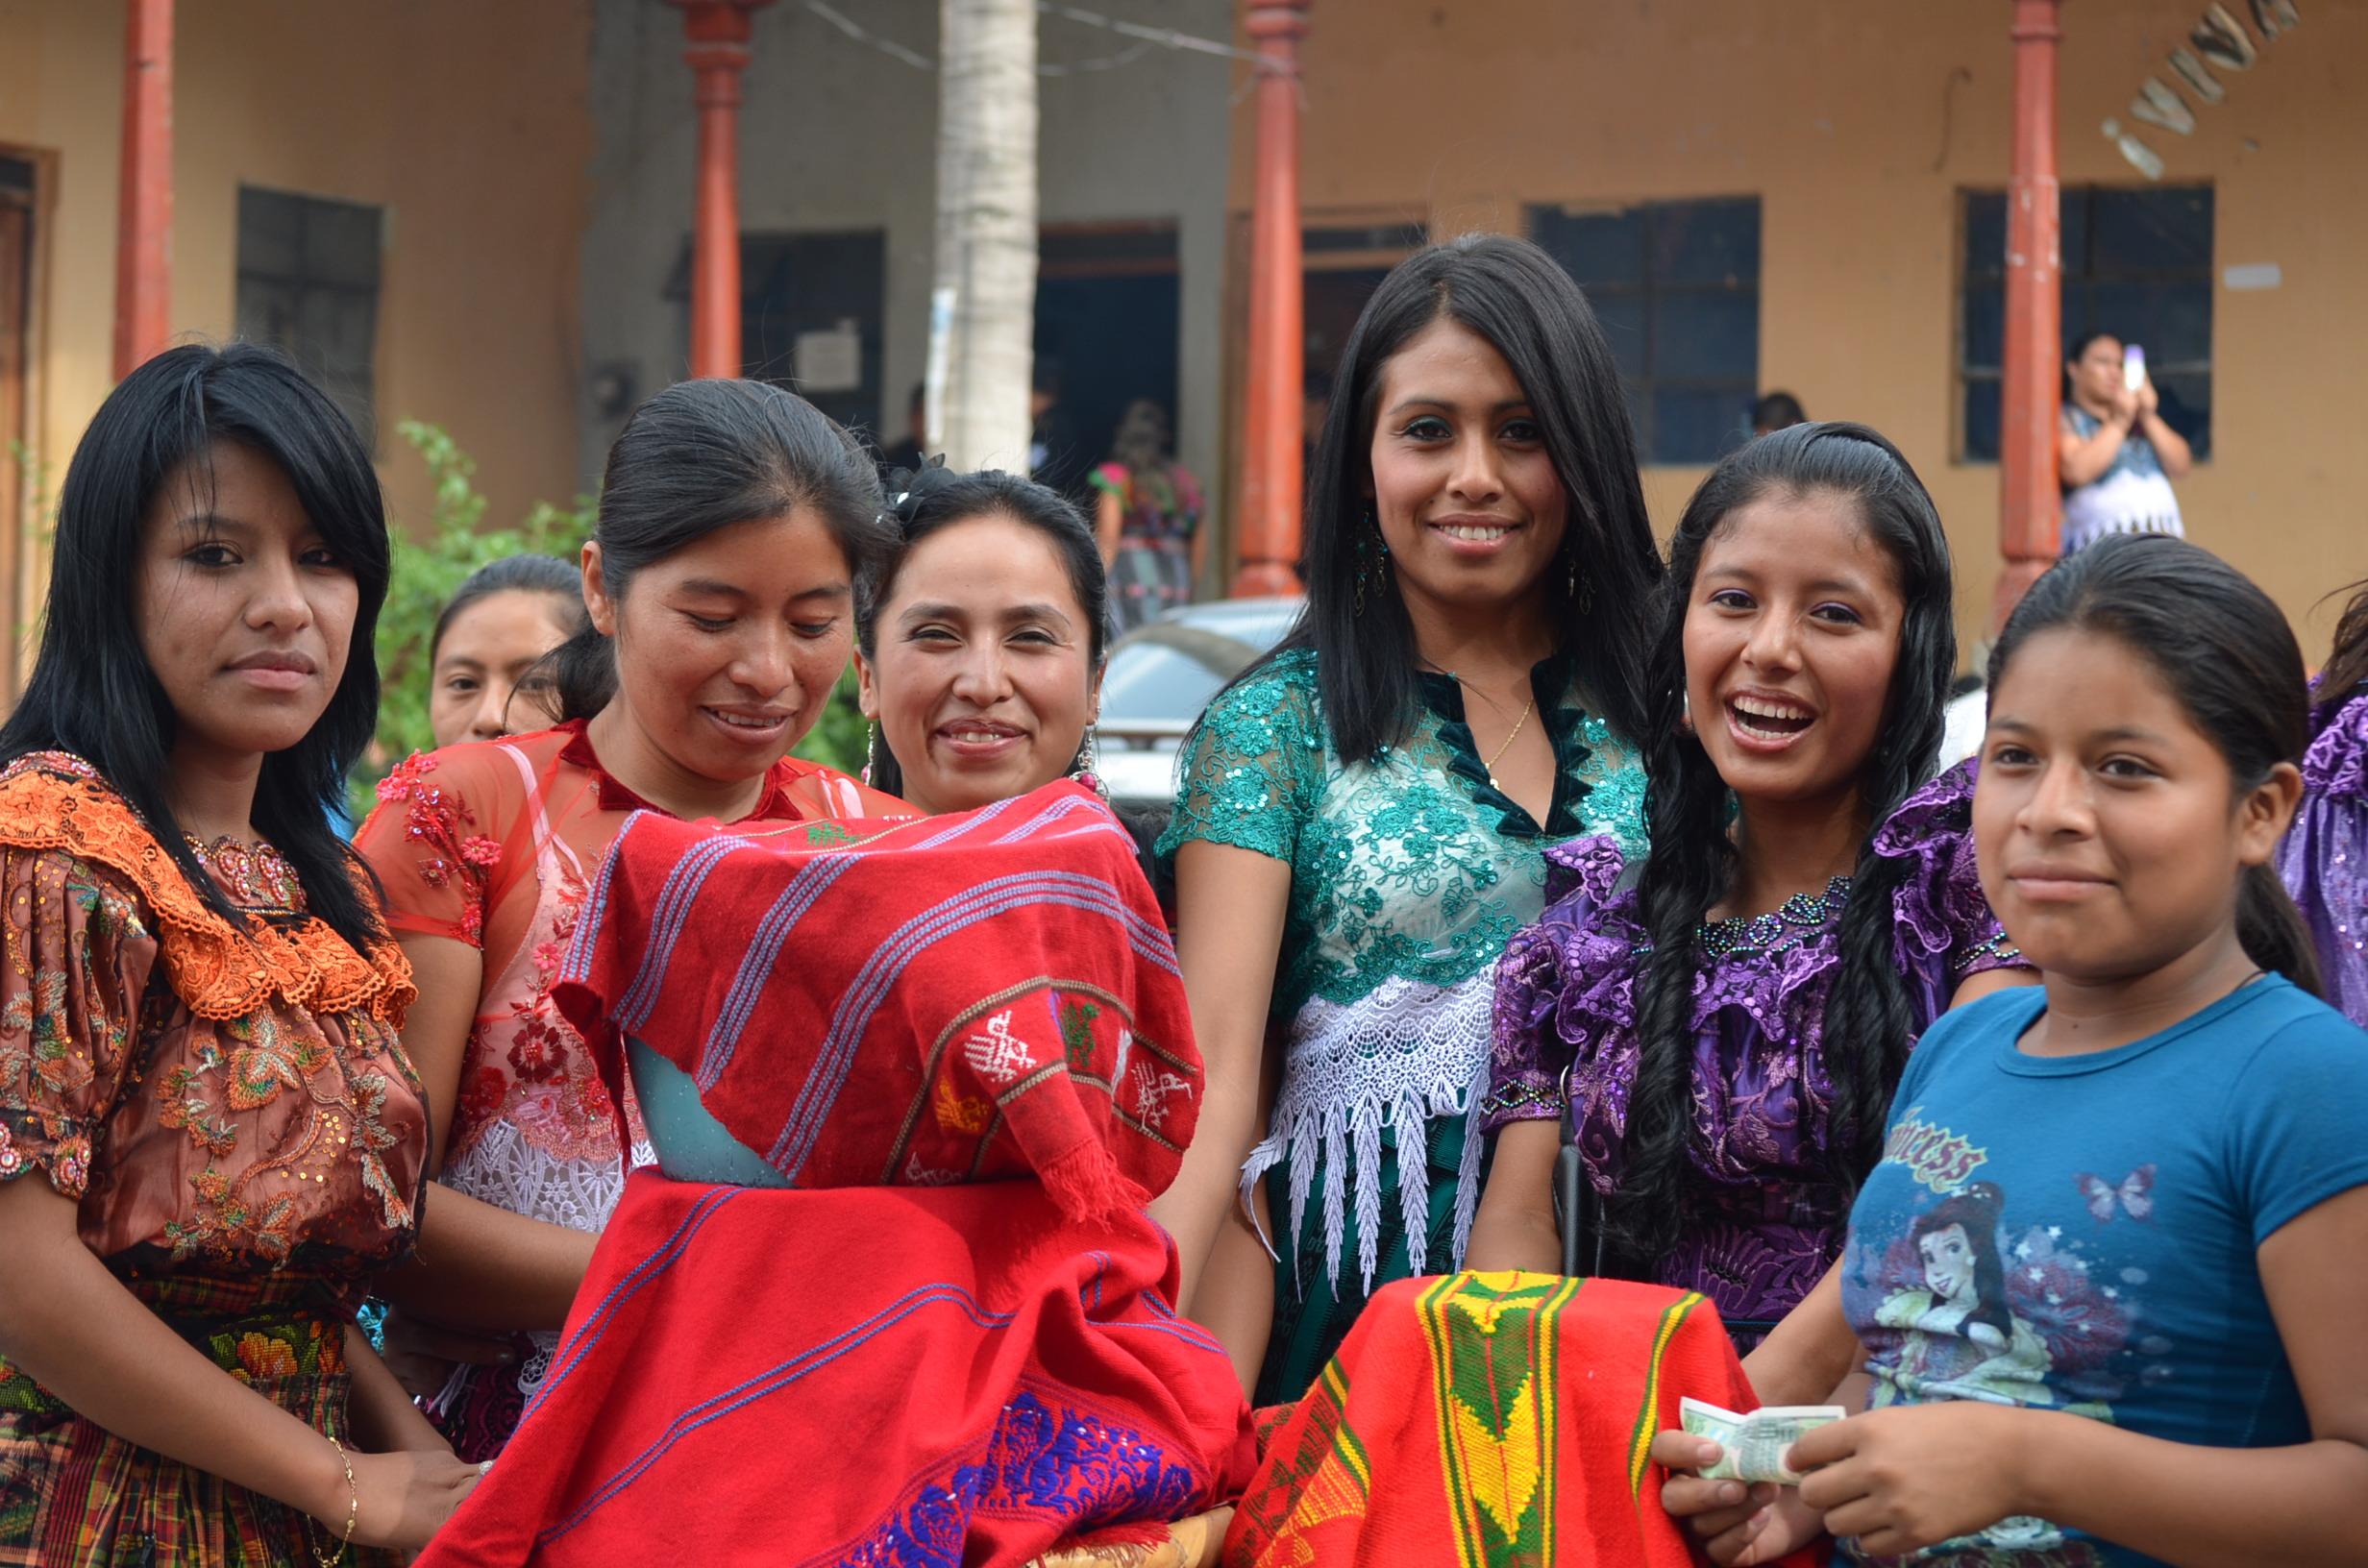 nahuala pic 41 - Los Idiomas de Guatemala